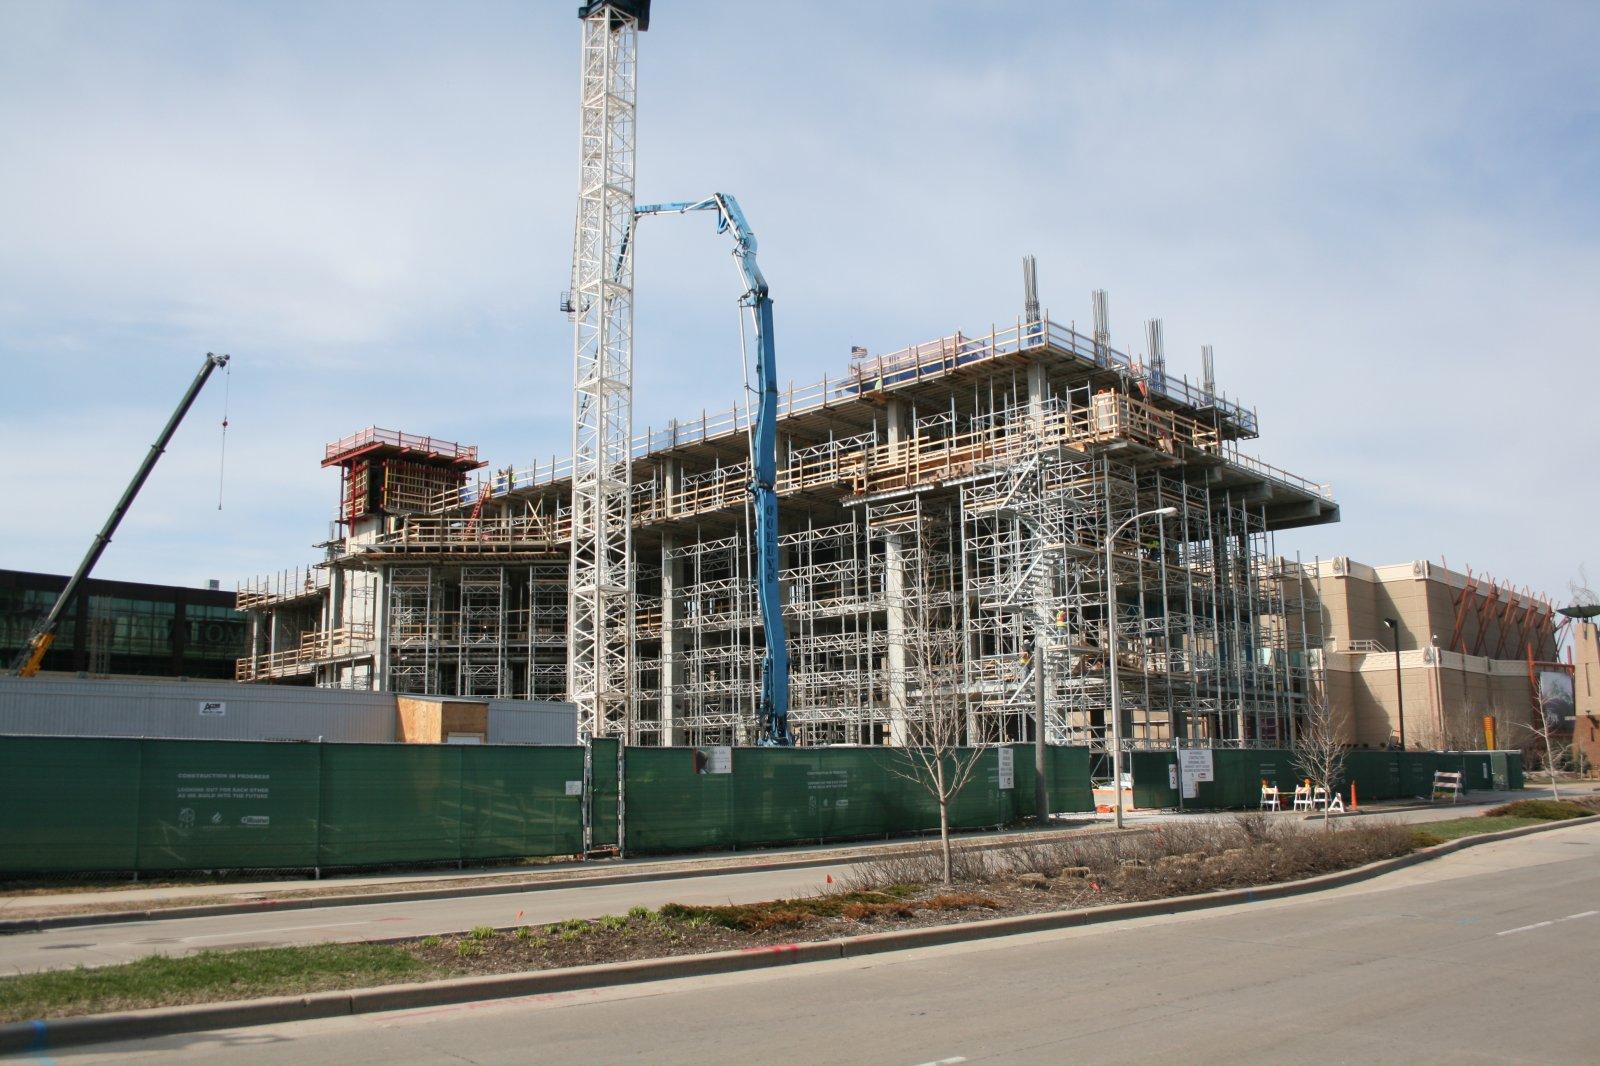 Potawatomi Casino Hotel under construction.